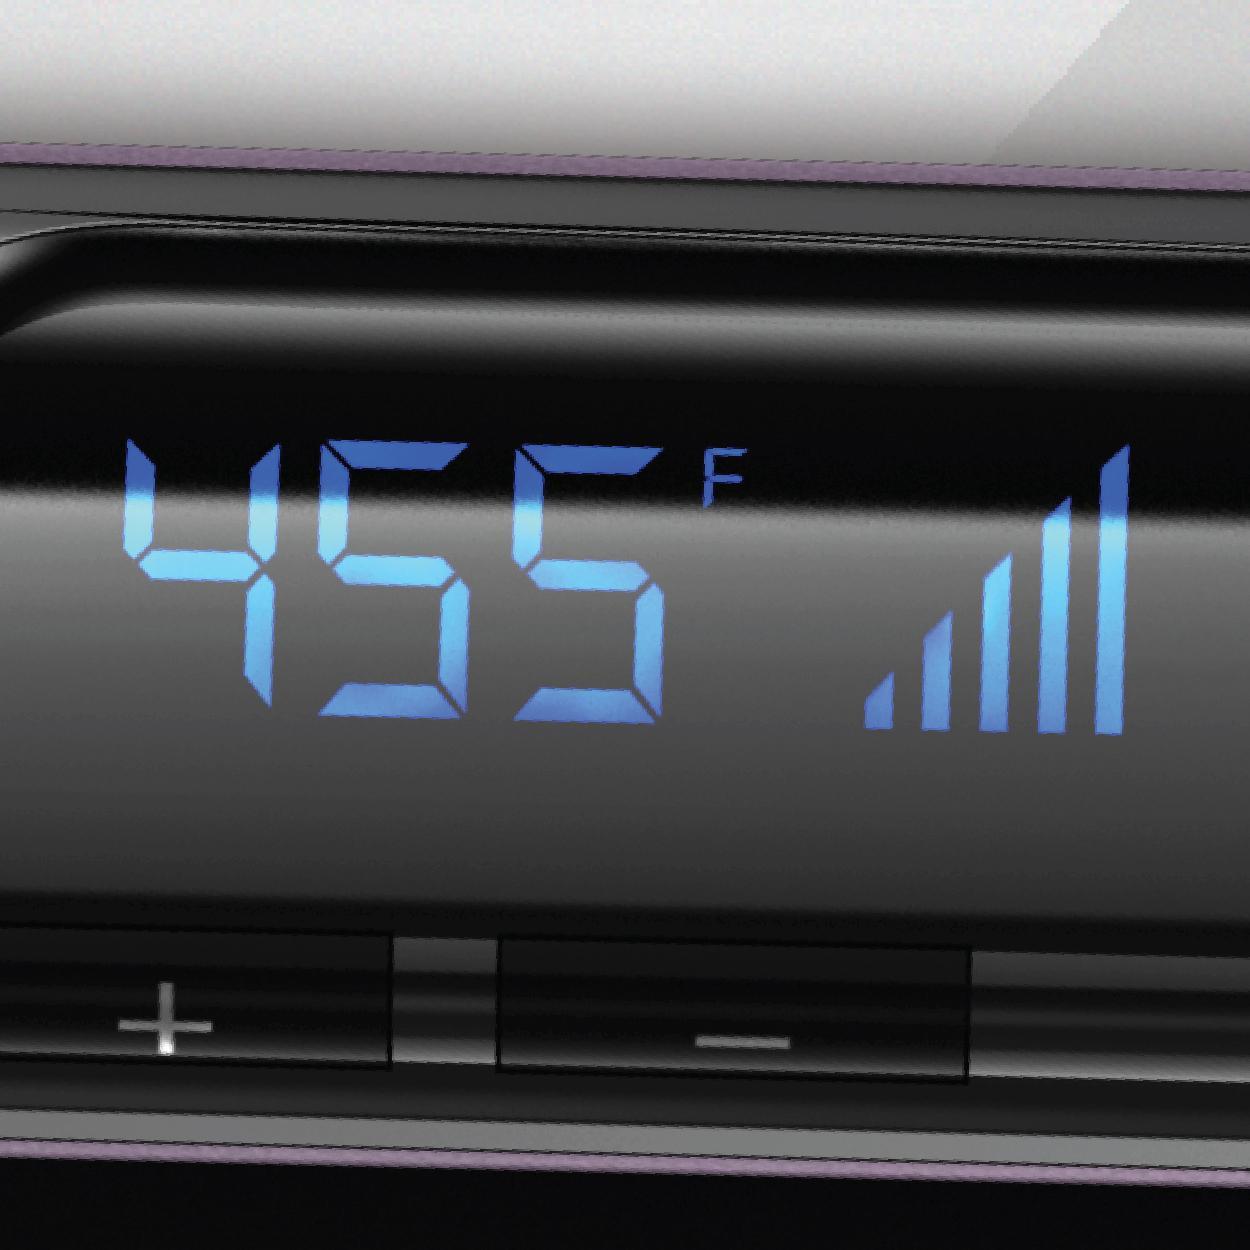 remington 870 deer slug gun car interior design. Black Bedroom Furniture Sets. Home Design Ideas